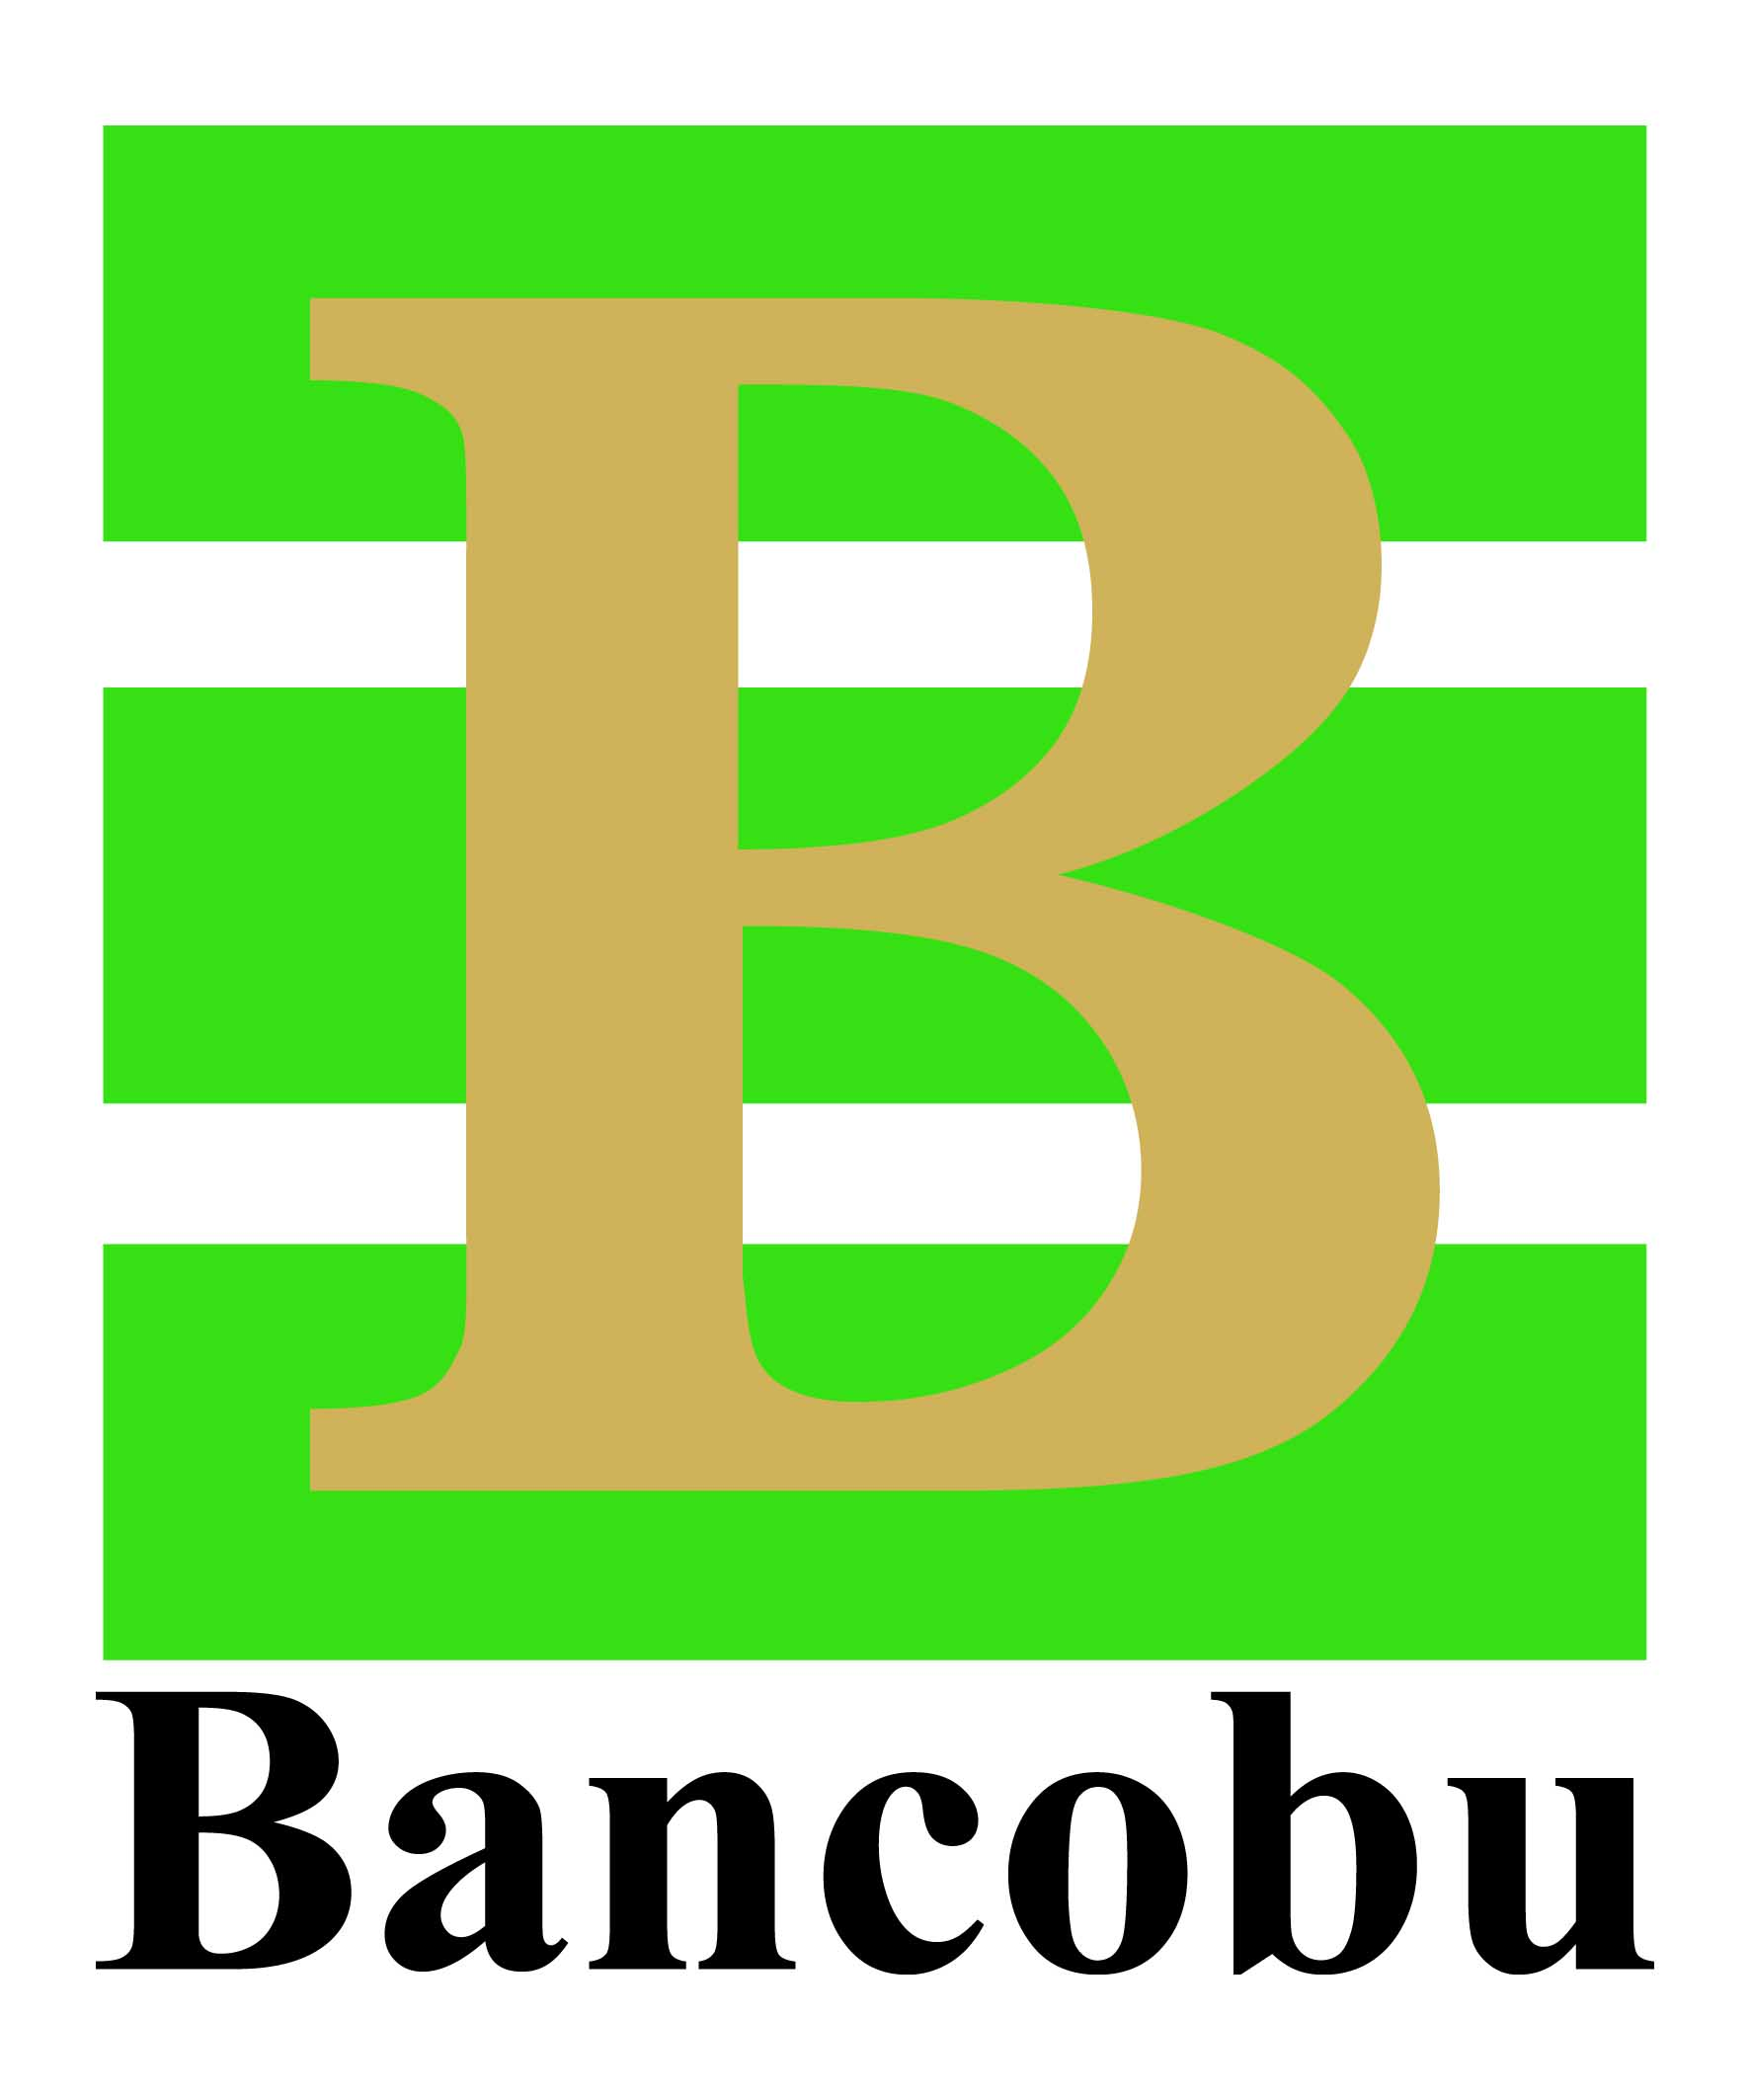 Bancobu